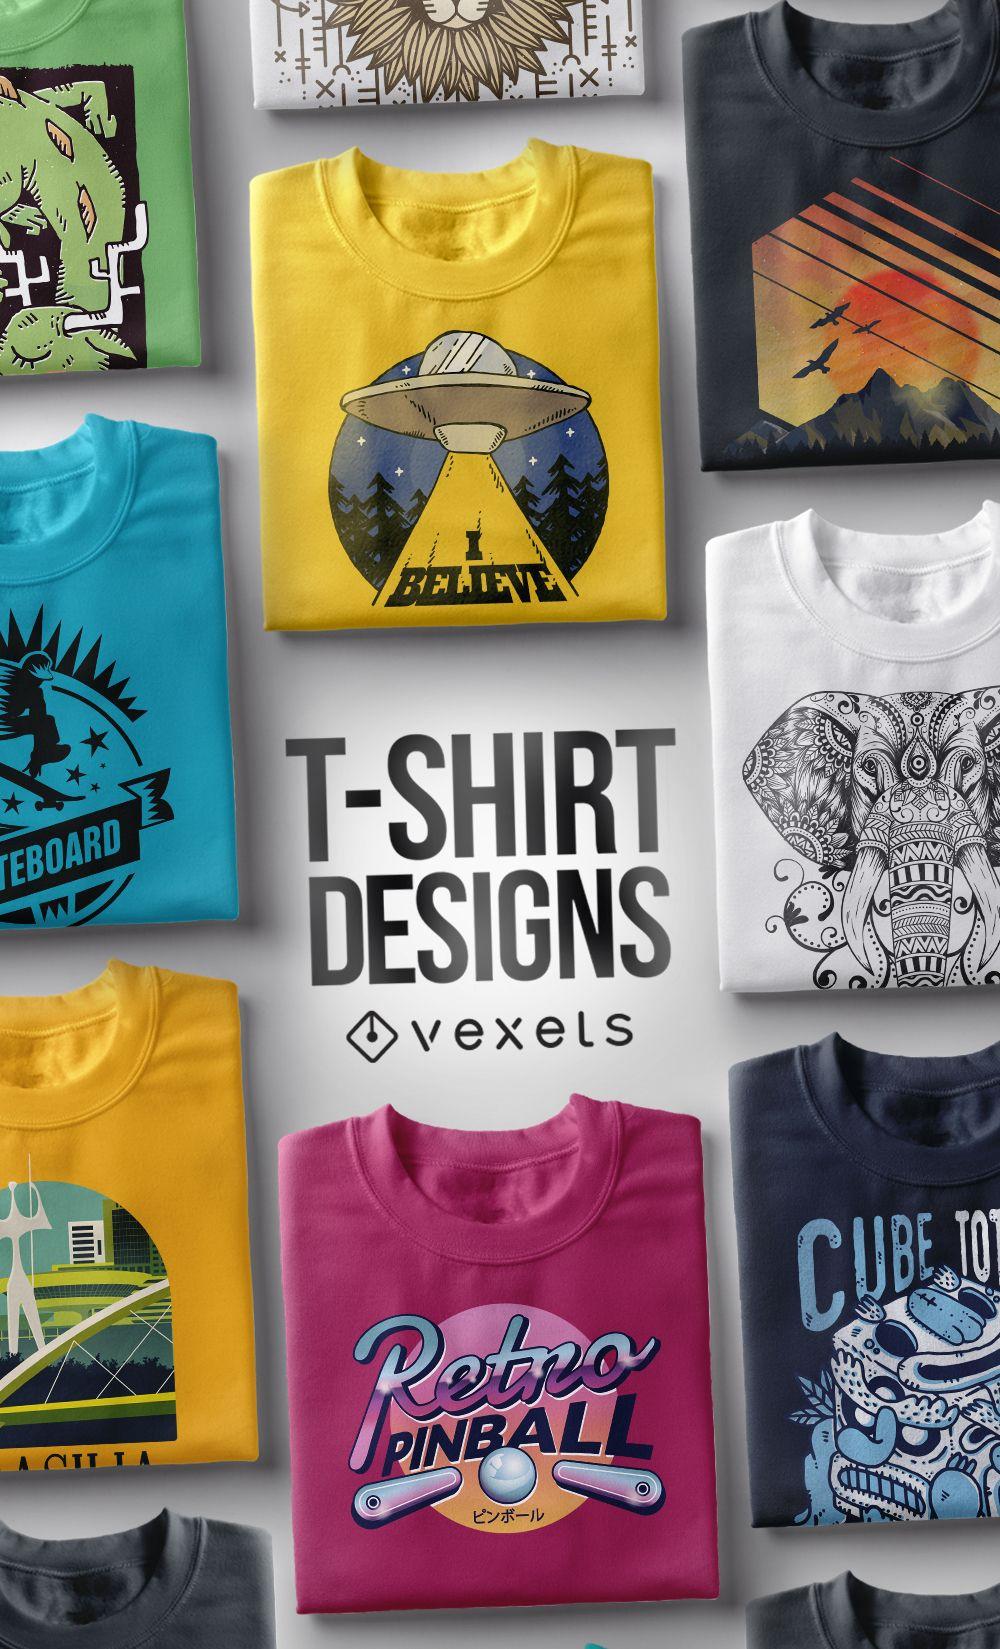 Merch Ready T Shirt Designs Made For Platforms Like Amazon Merch Etsy Redbubble Sunfrog T Shirt Design Template Shirt Design Inspiration Shirt Logo Design